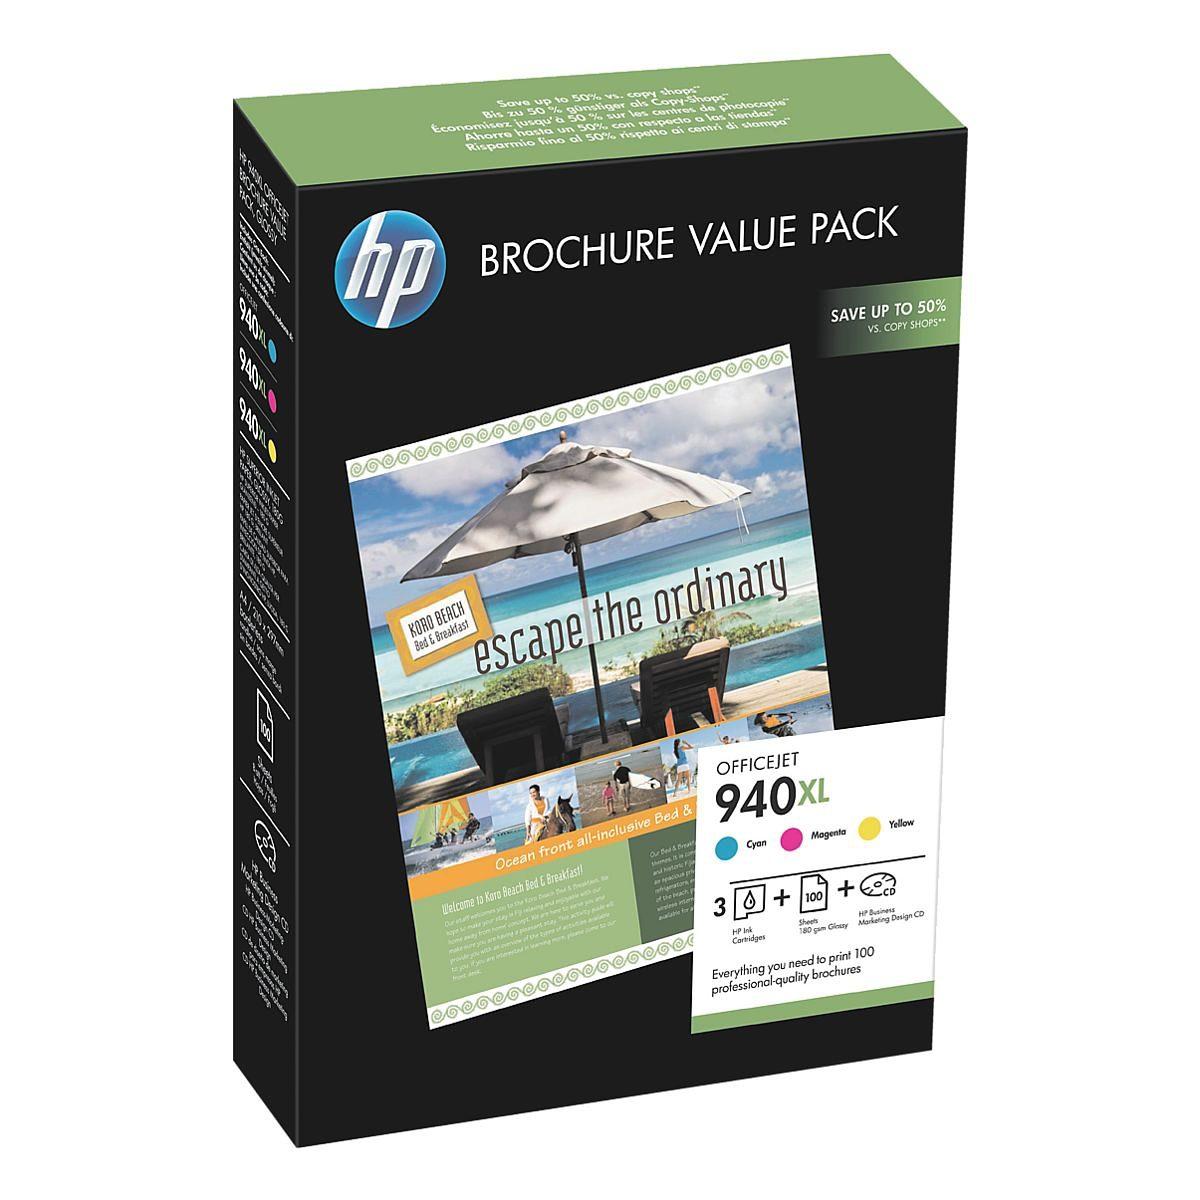 HP Tintenpatronen-Set »HP CG898AE« HP 940XL mit Papier